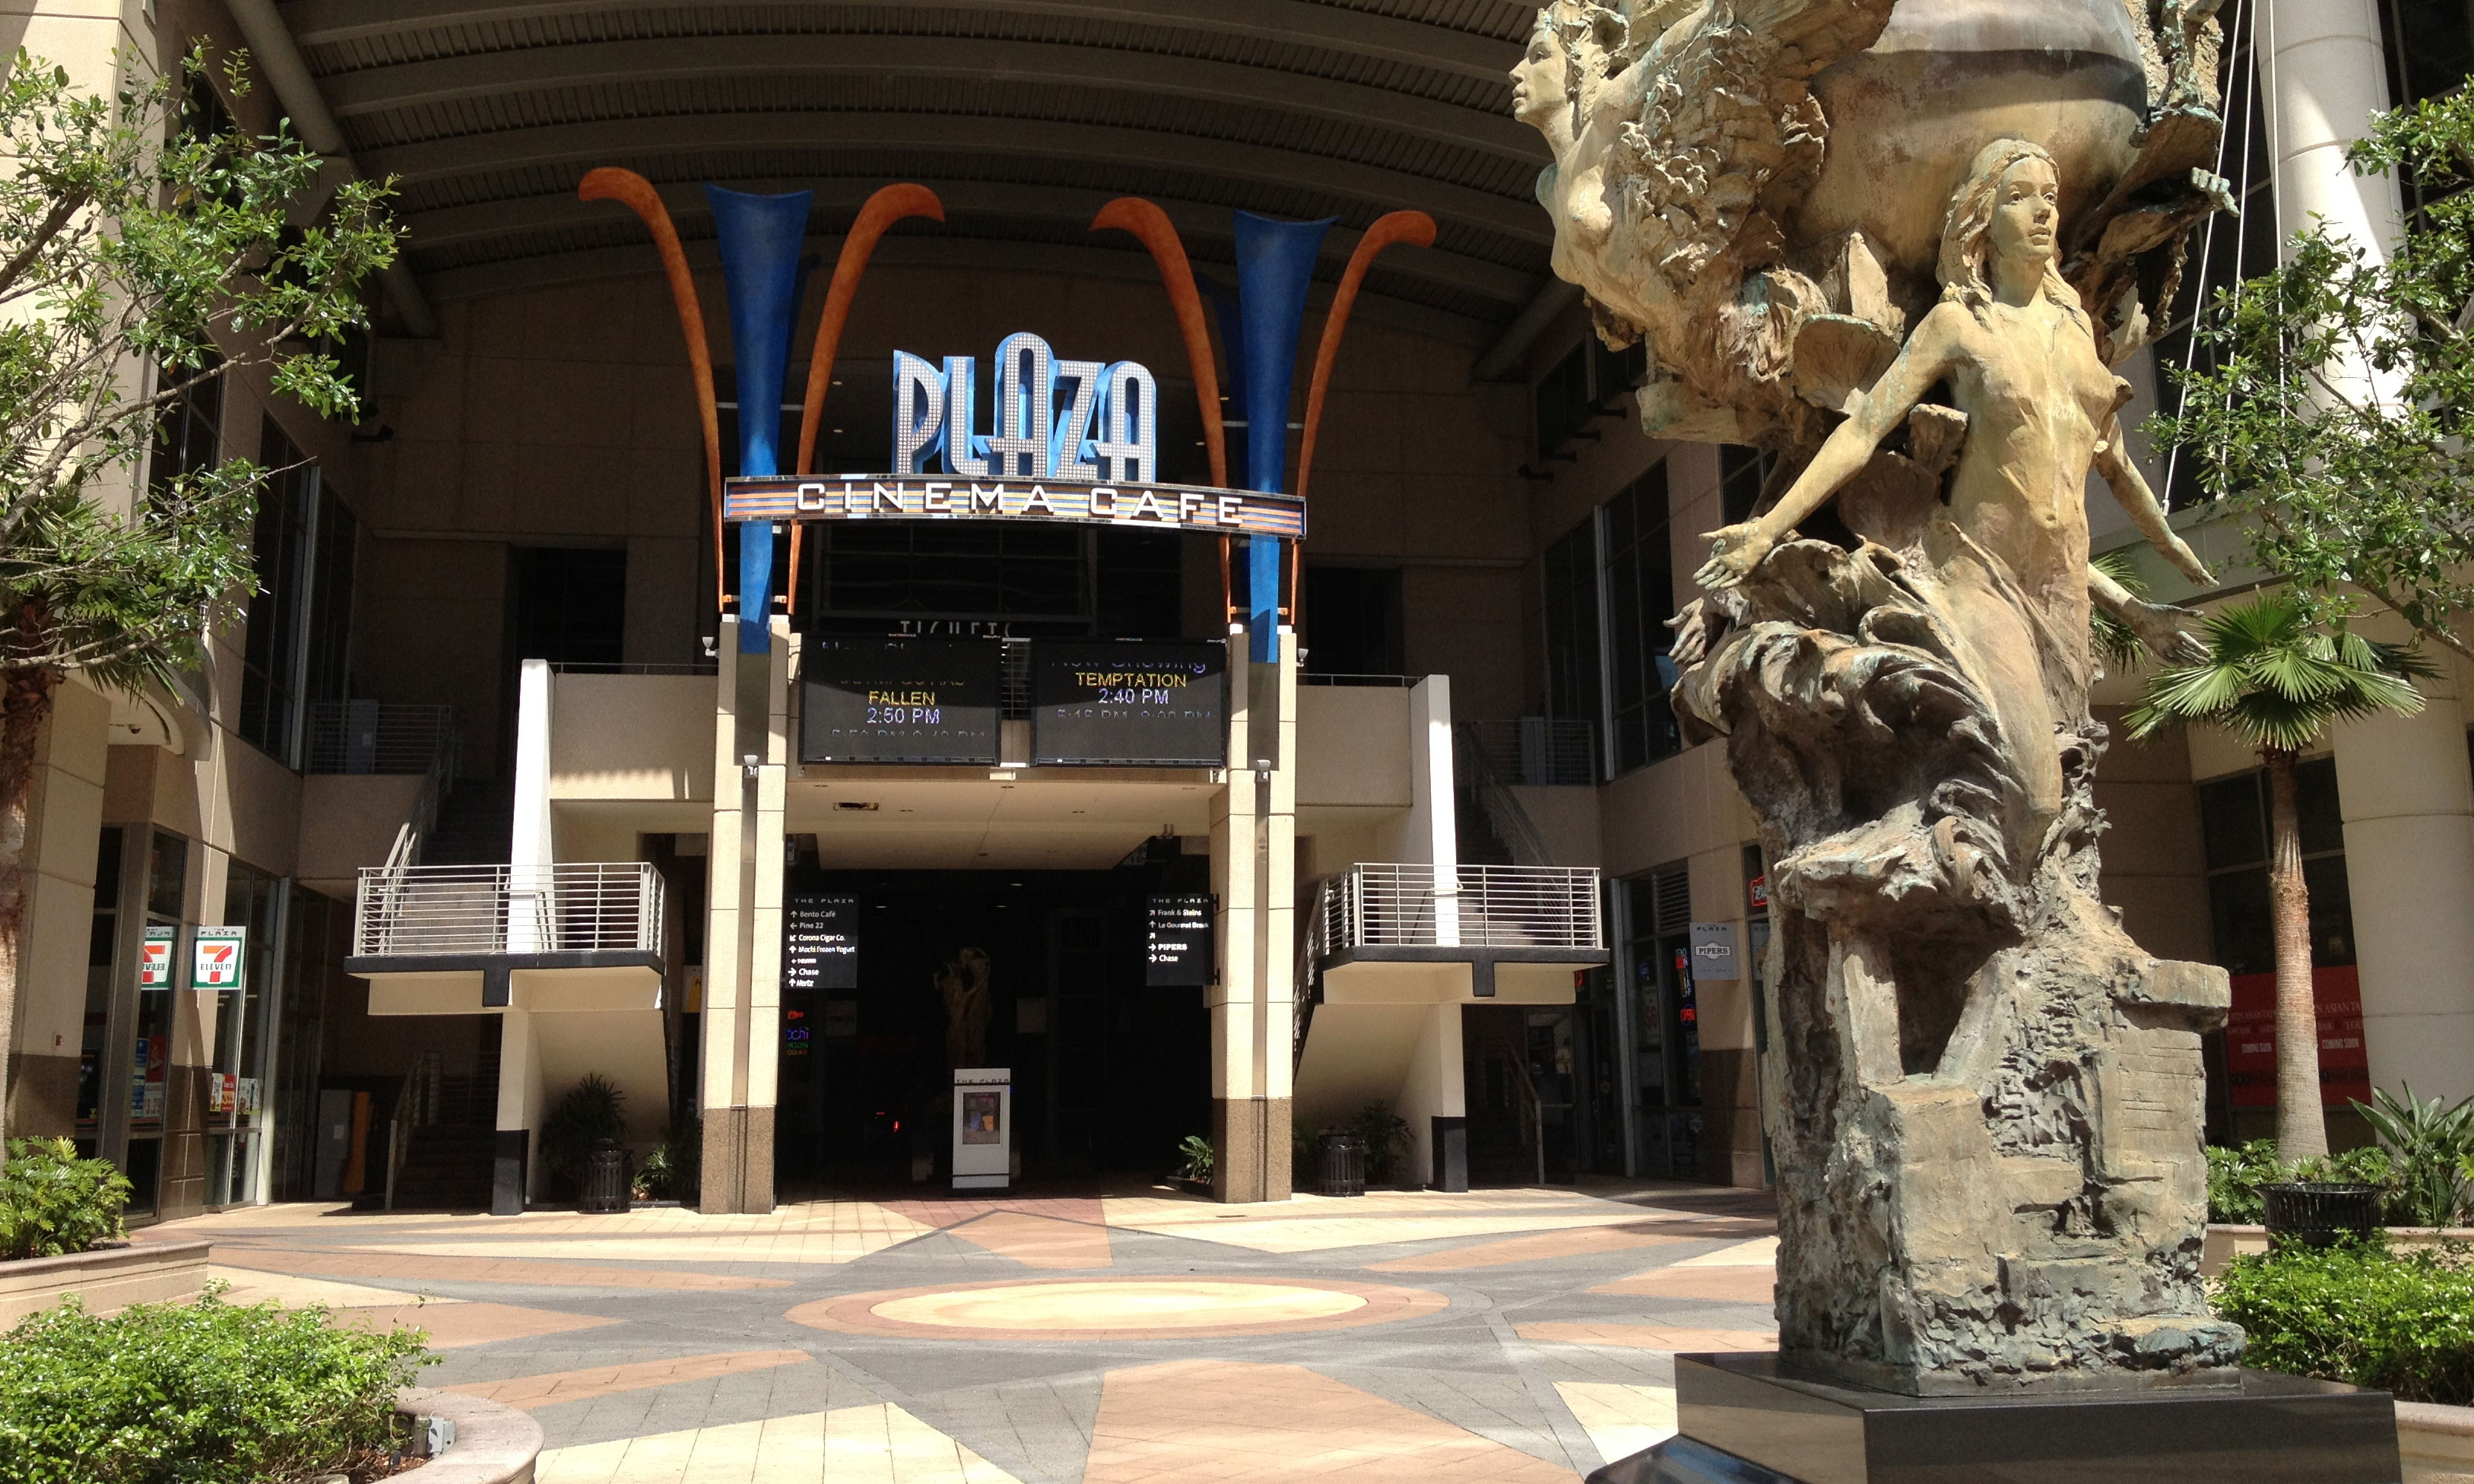 Cobb Plaza Cinema Cafe 12 Today S Orlando